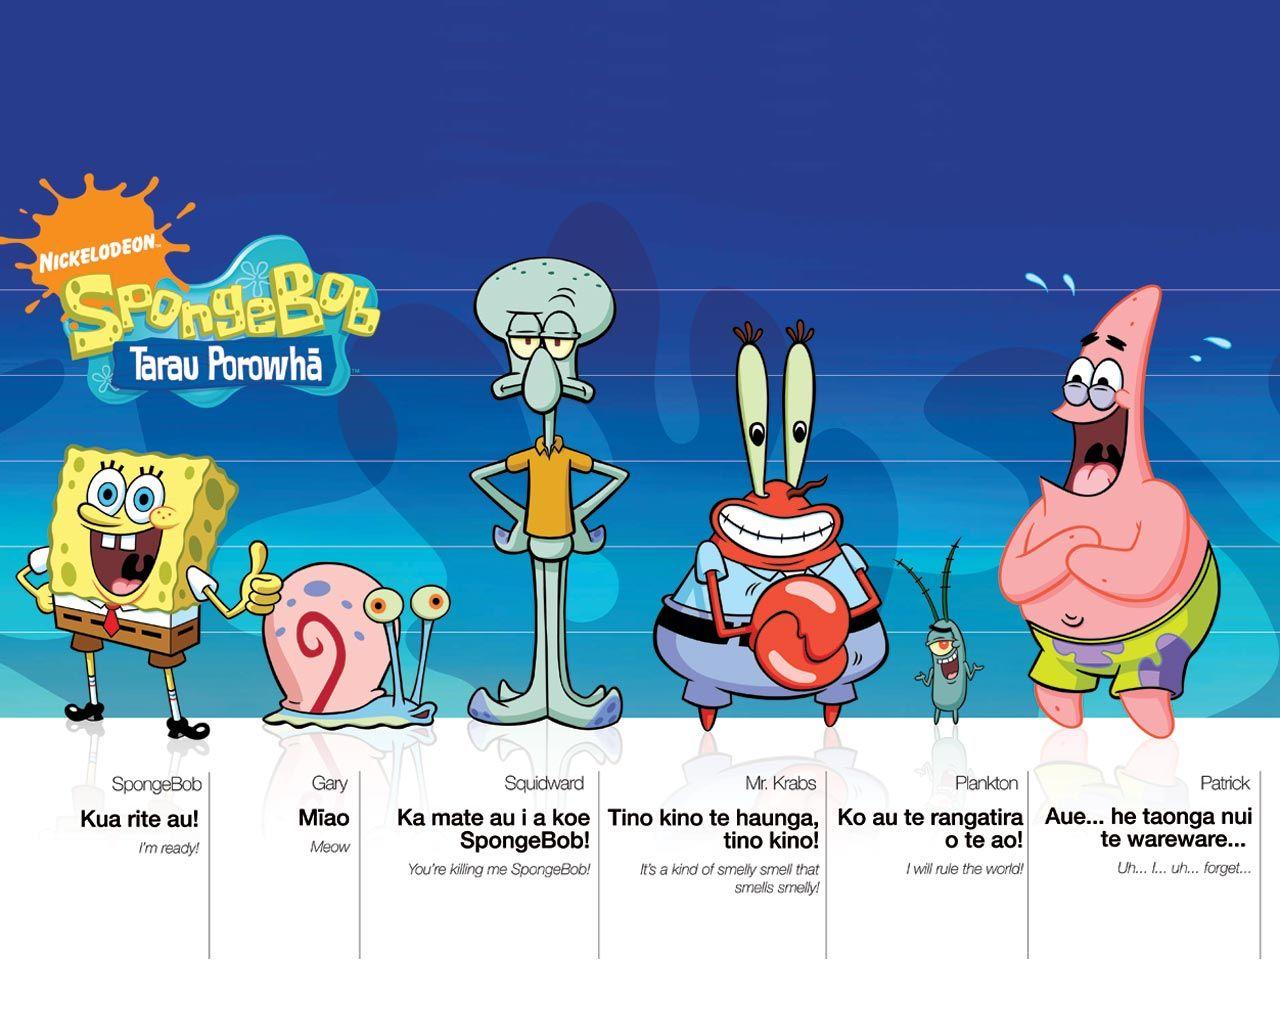 Spongebob,Gary, Squidward, Mr.krab, Plankton, and Patrick